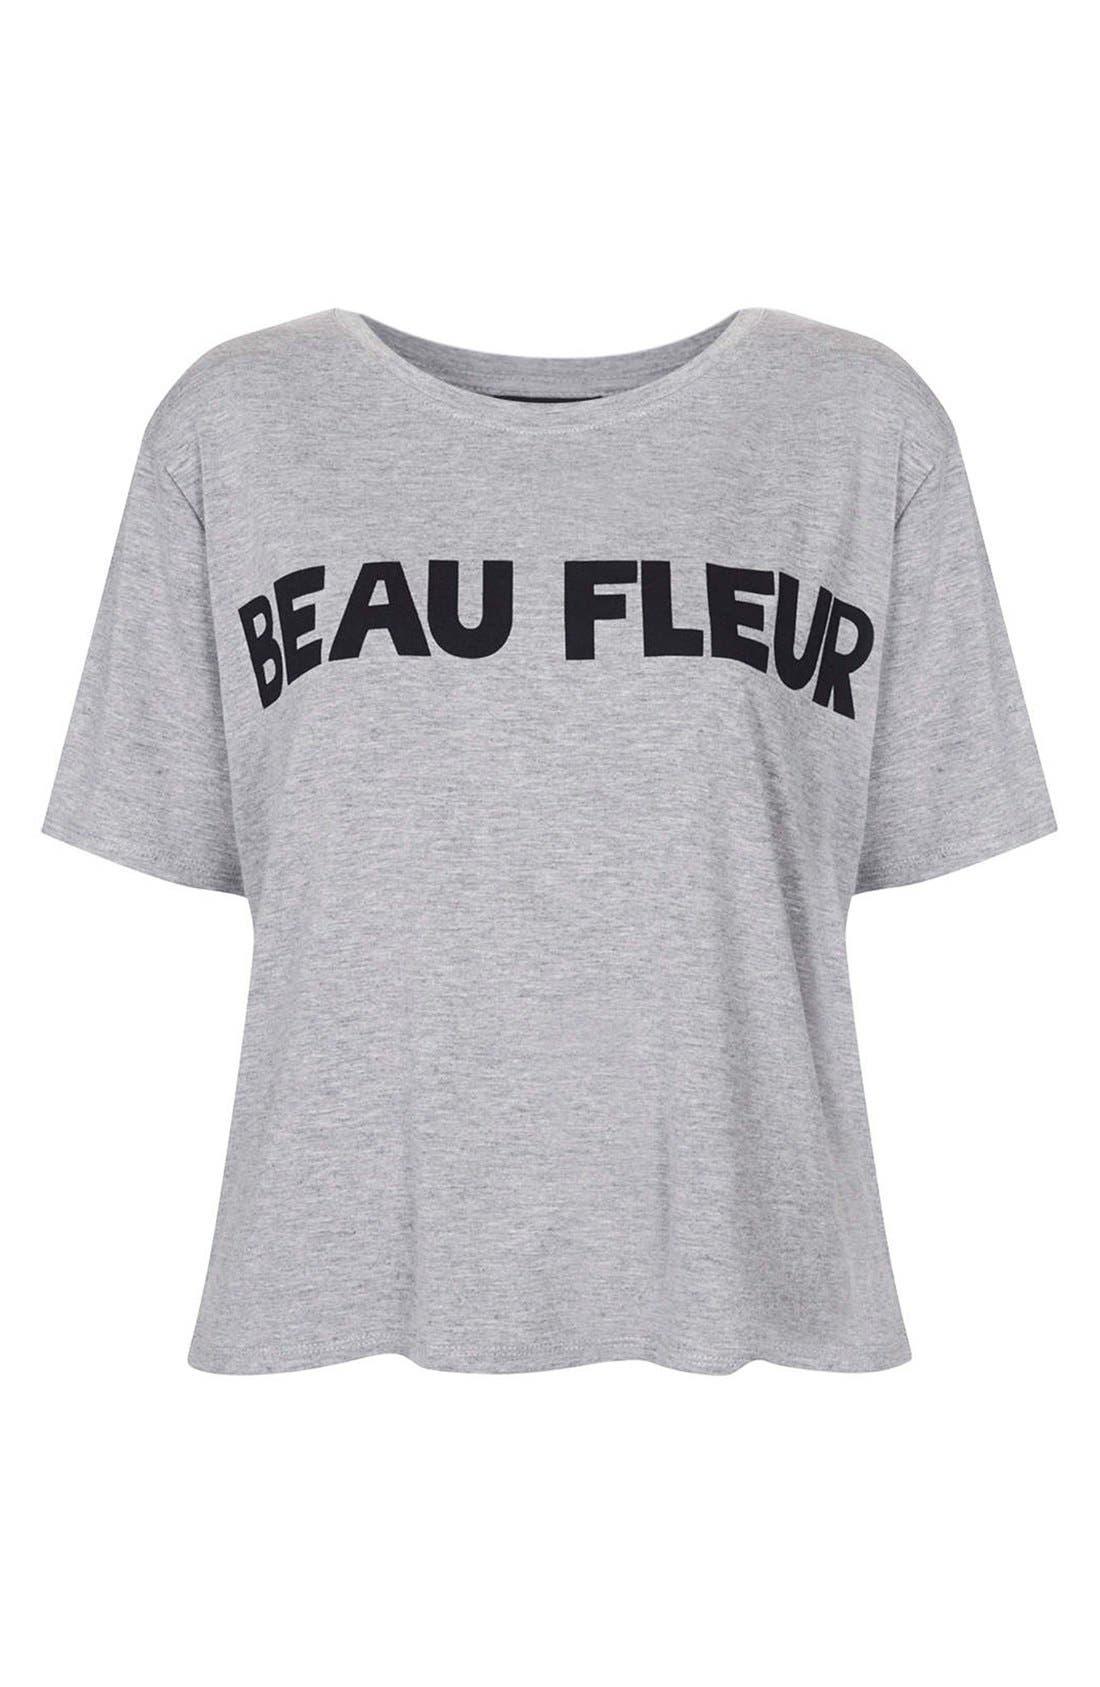 Alternate Image 3  - Topshop 'Beau Fleur' Graphic Tee